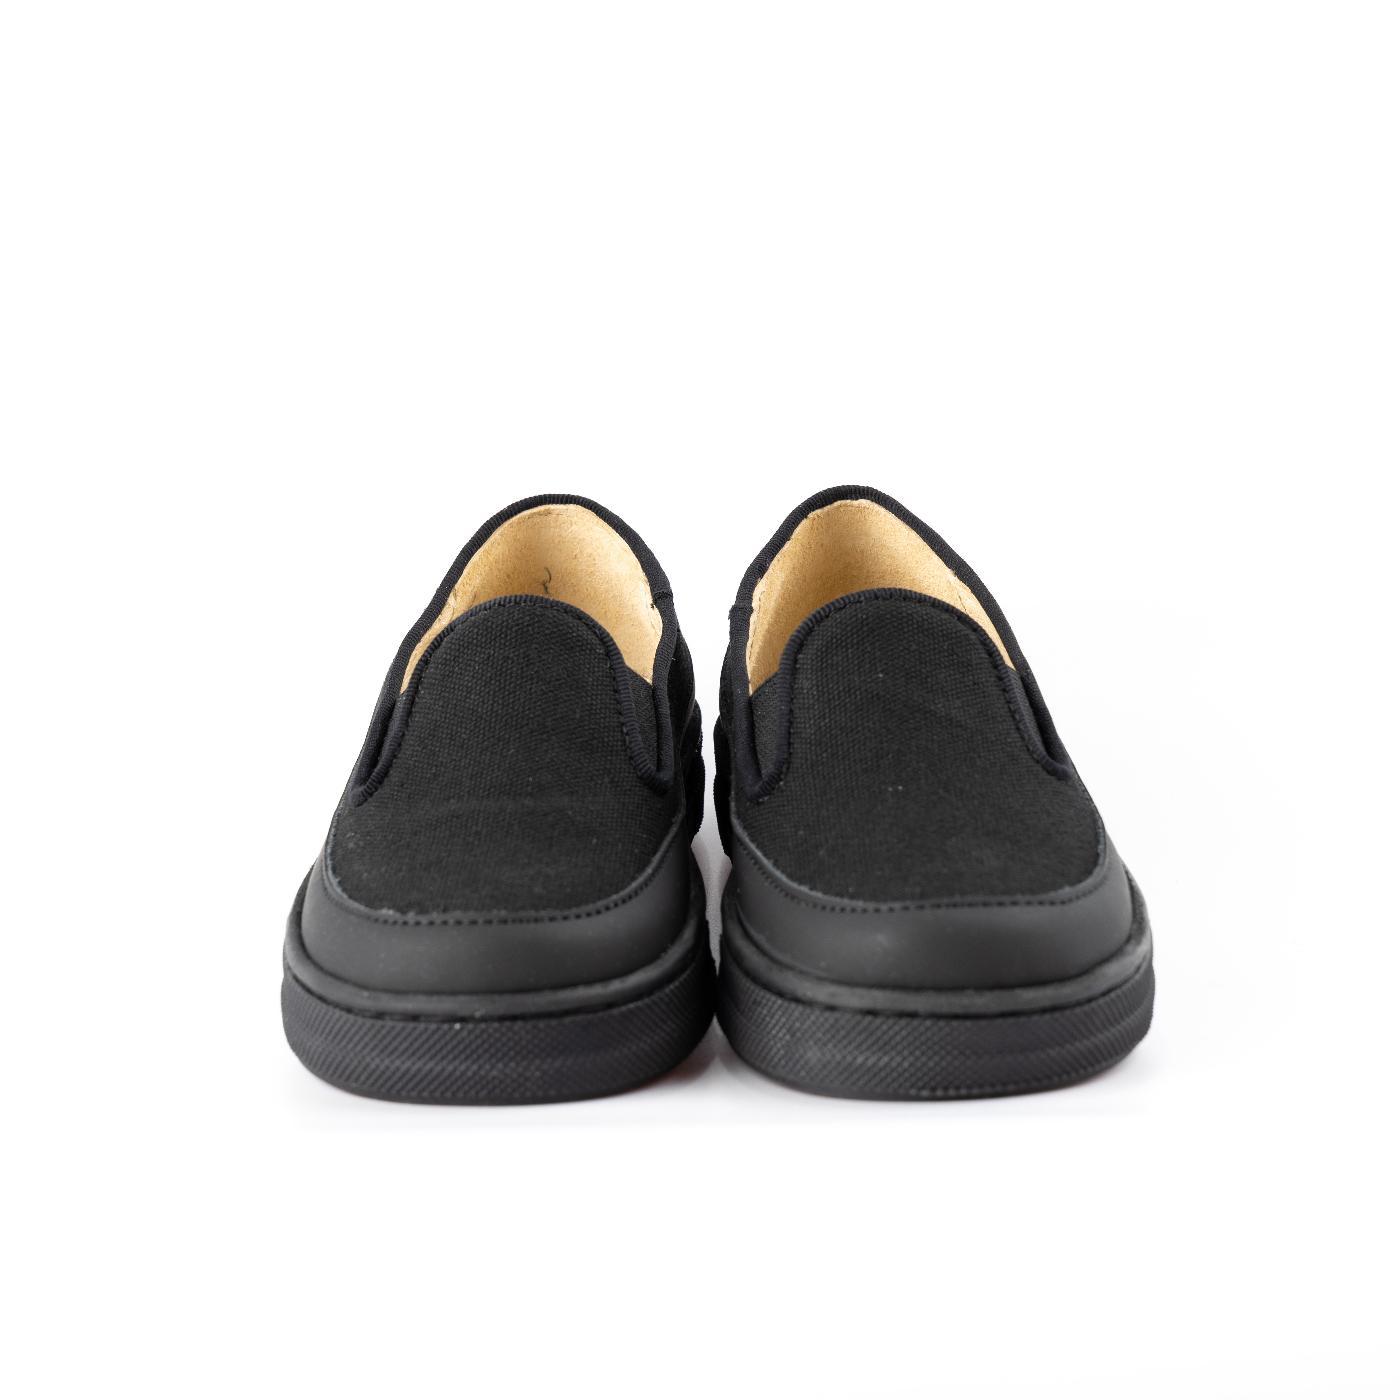 Black slip on Plimsoles